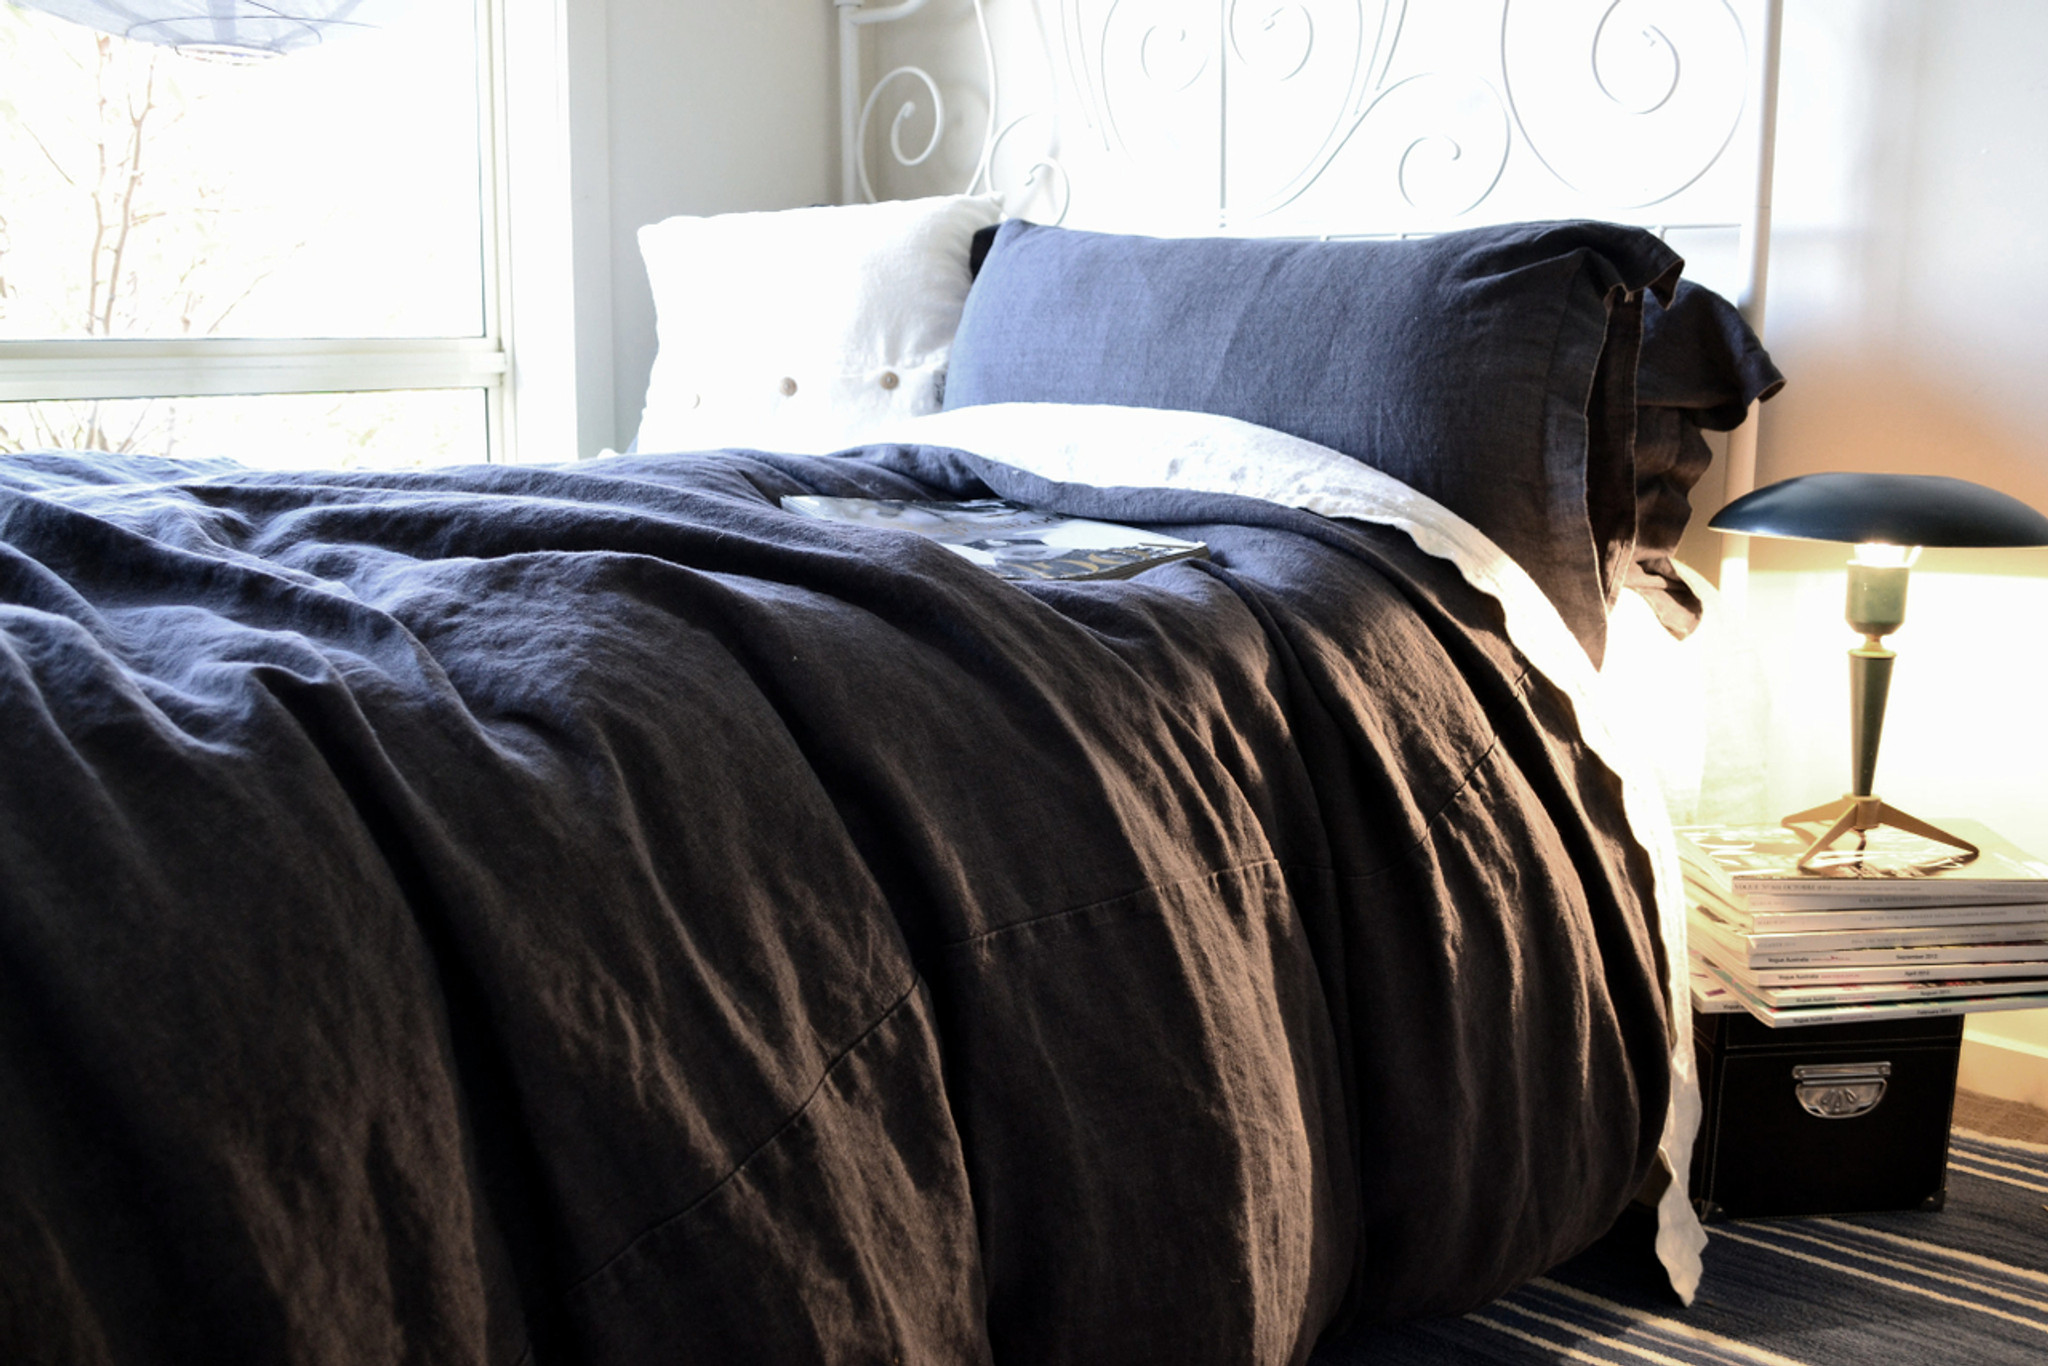 peppercorn dark grey rustic heavy weight linen duvet quilt cover. Black Bedroom Furniture Sets. Home Design Ideas